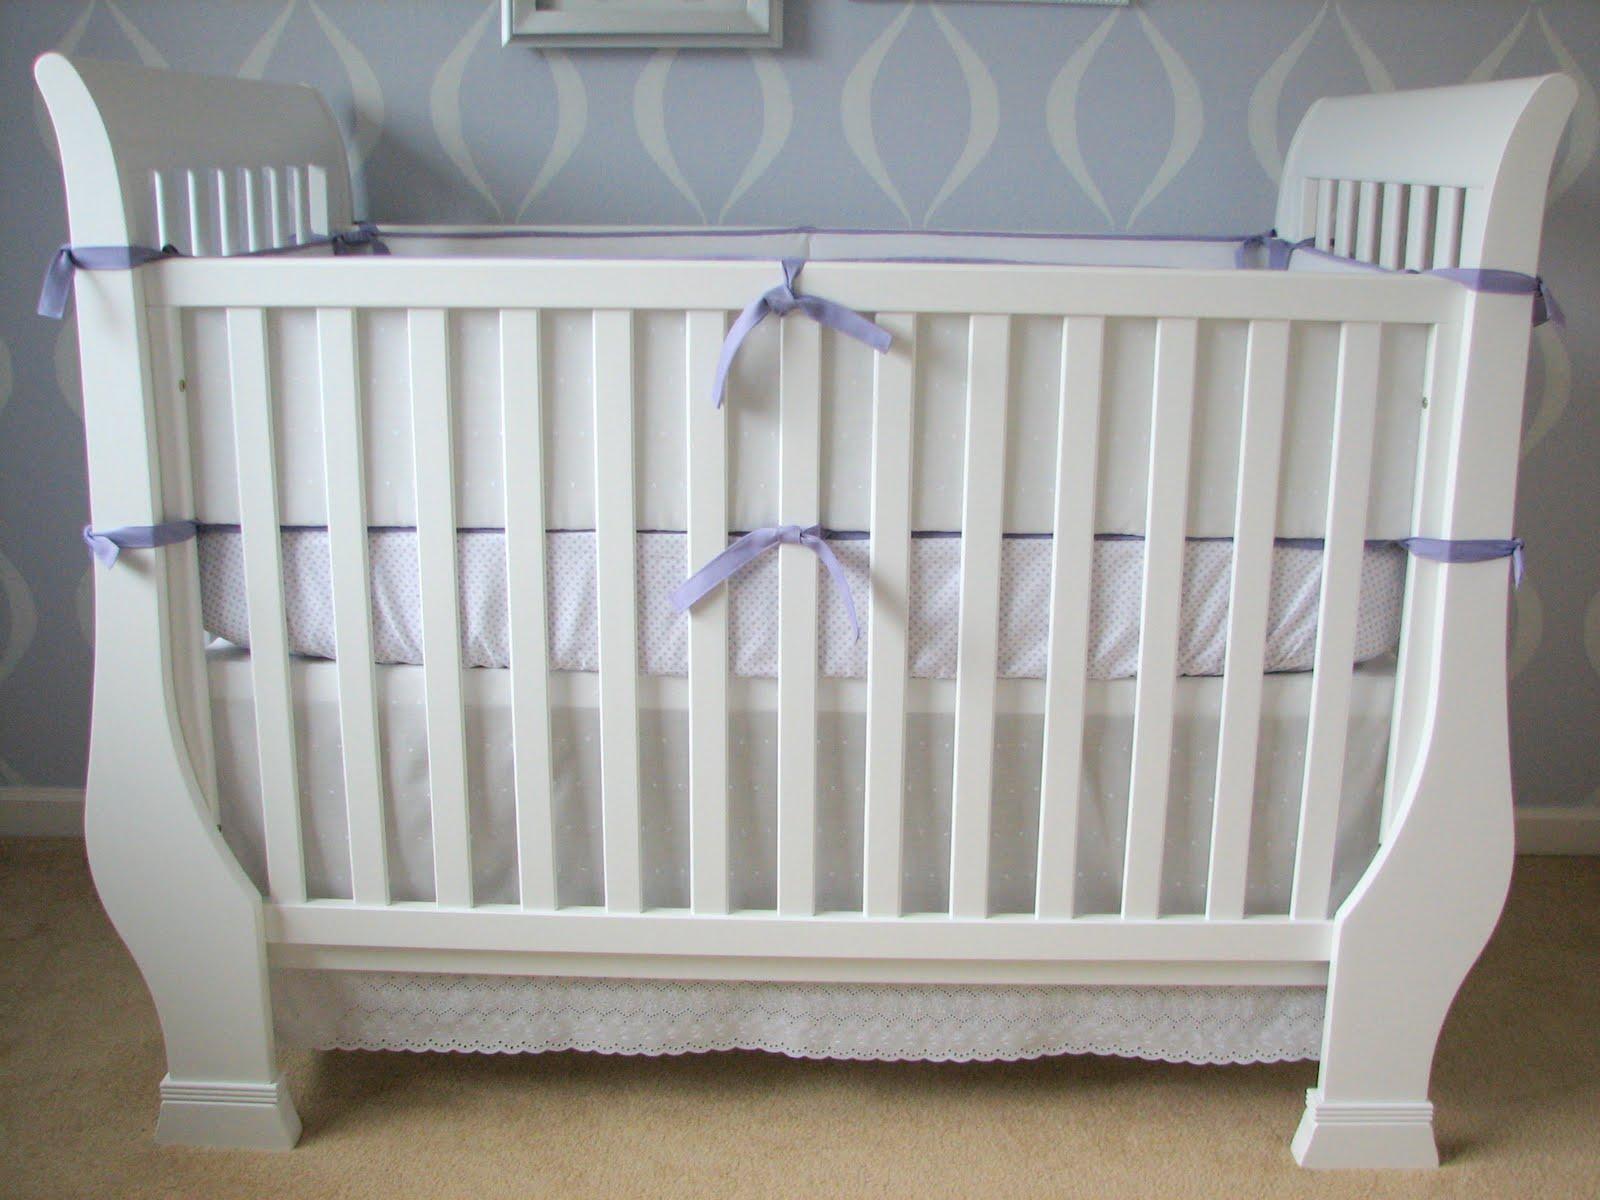 Baby crib gertie - Baby Girl S Nursery Crib Bedding